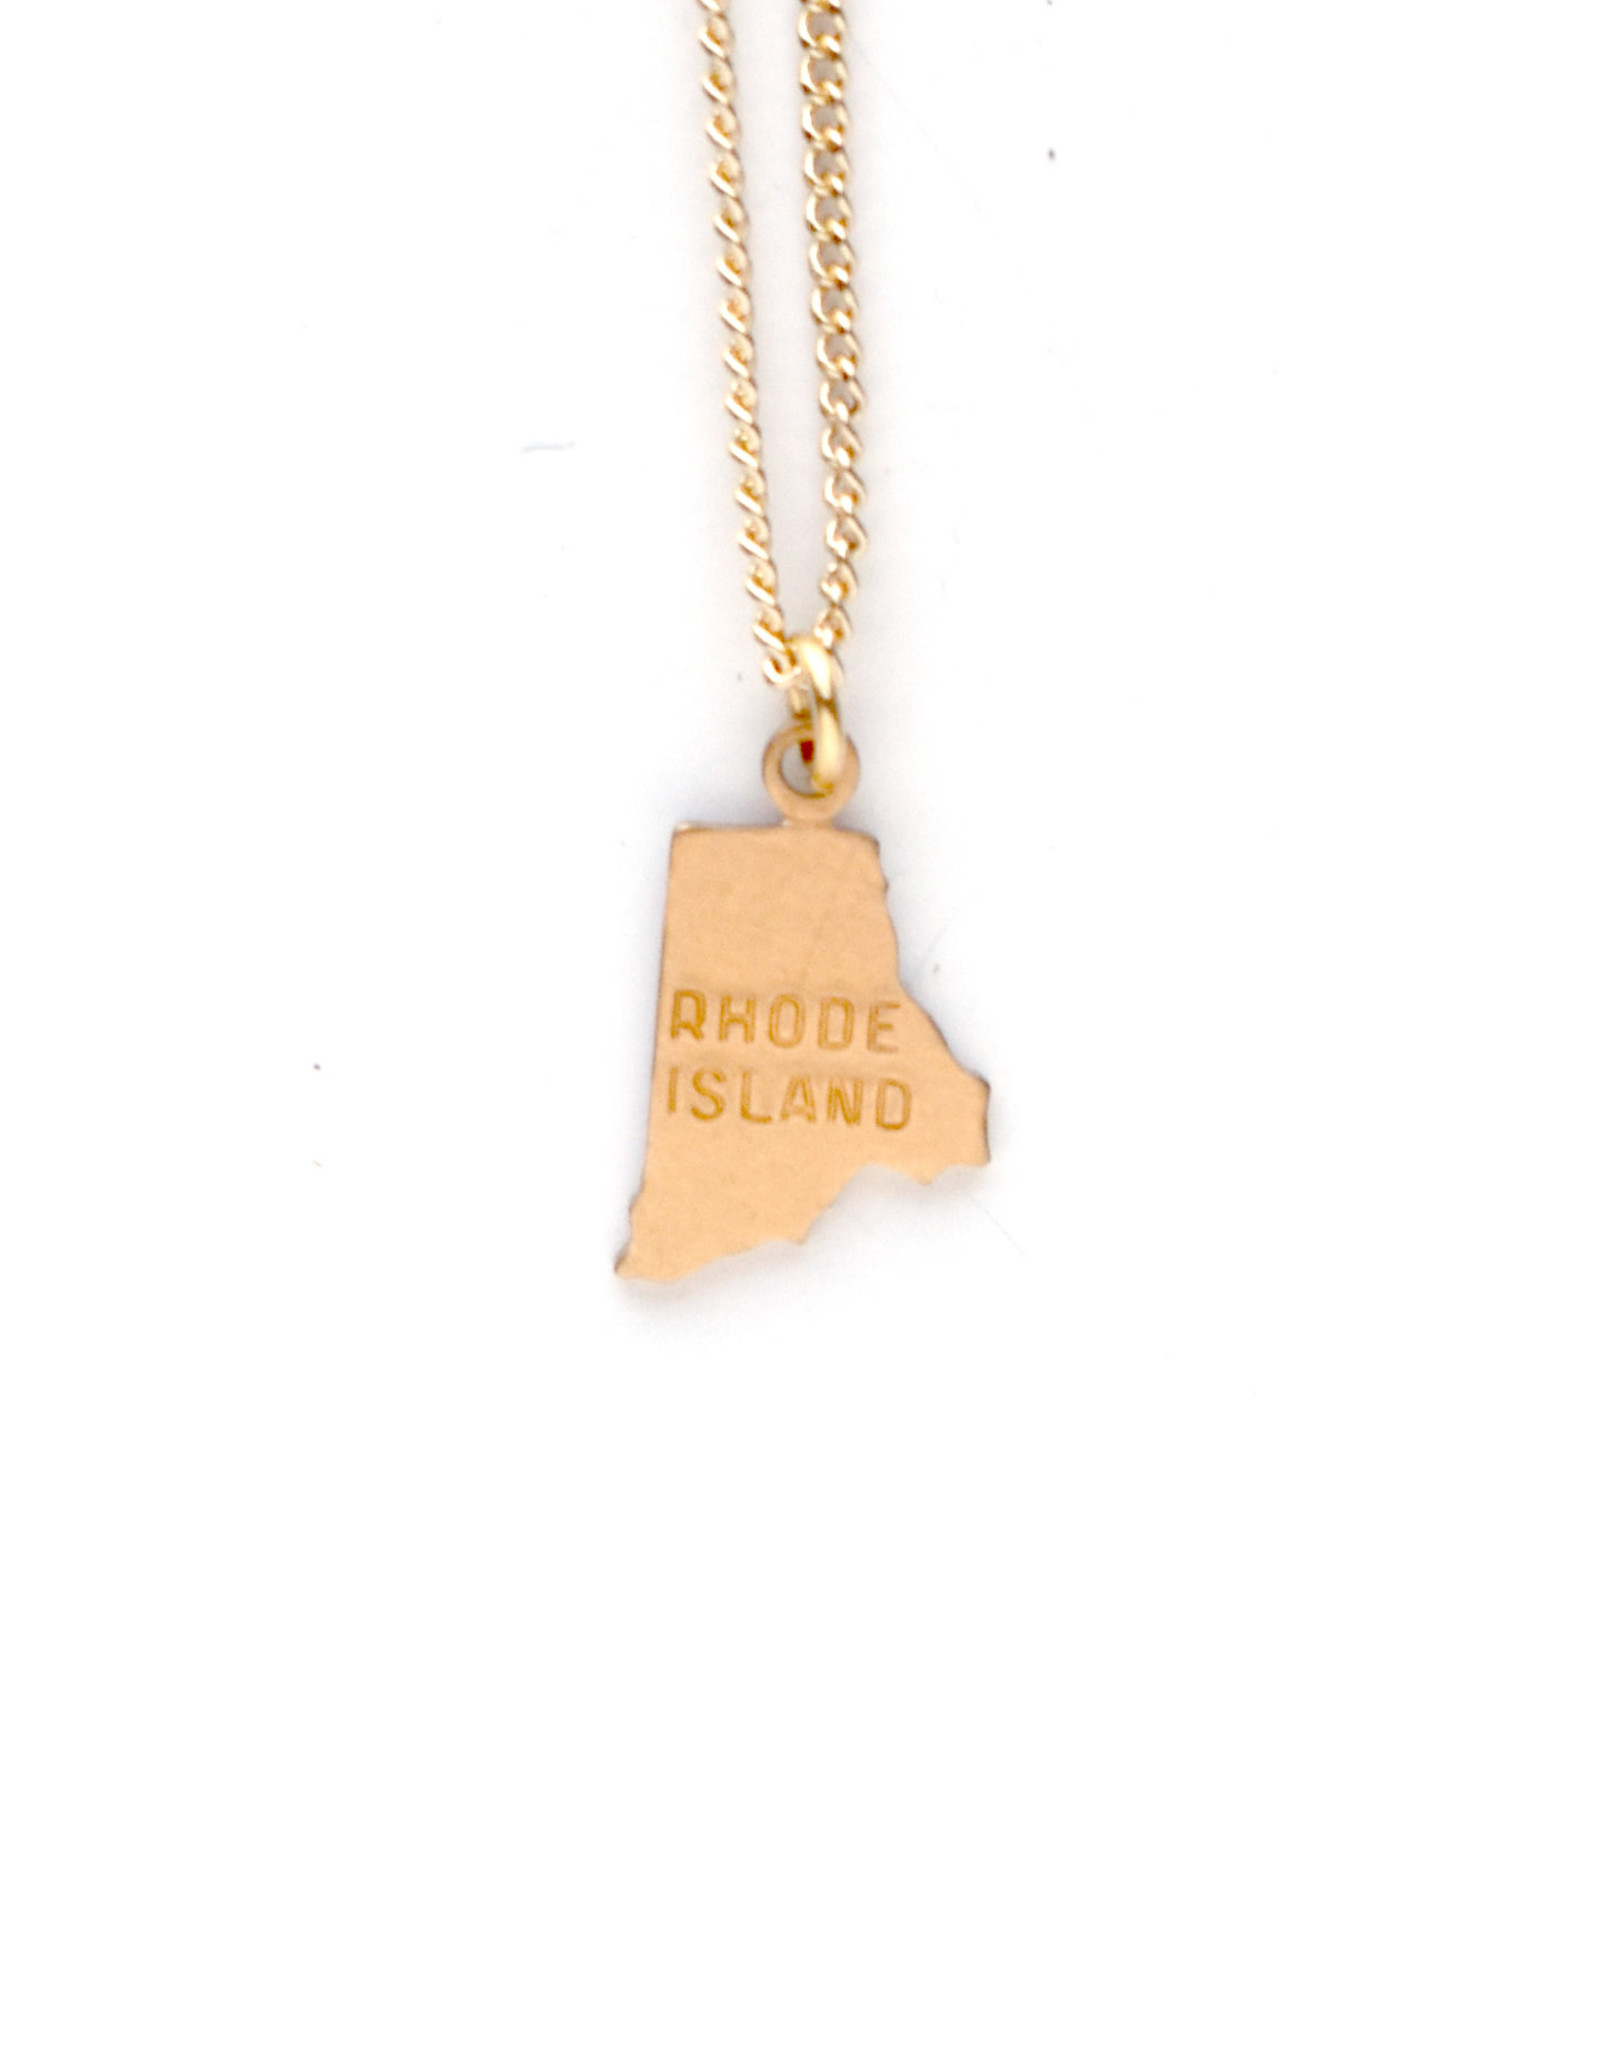 Rhode Island Charm Necklace